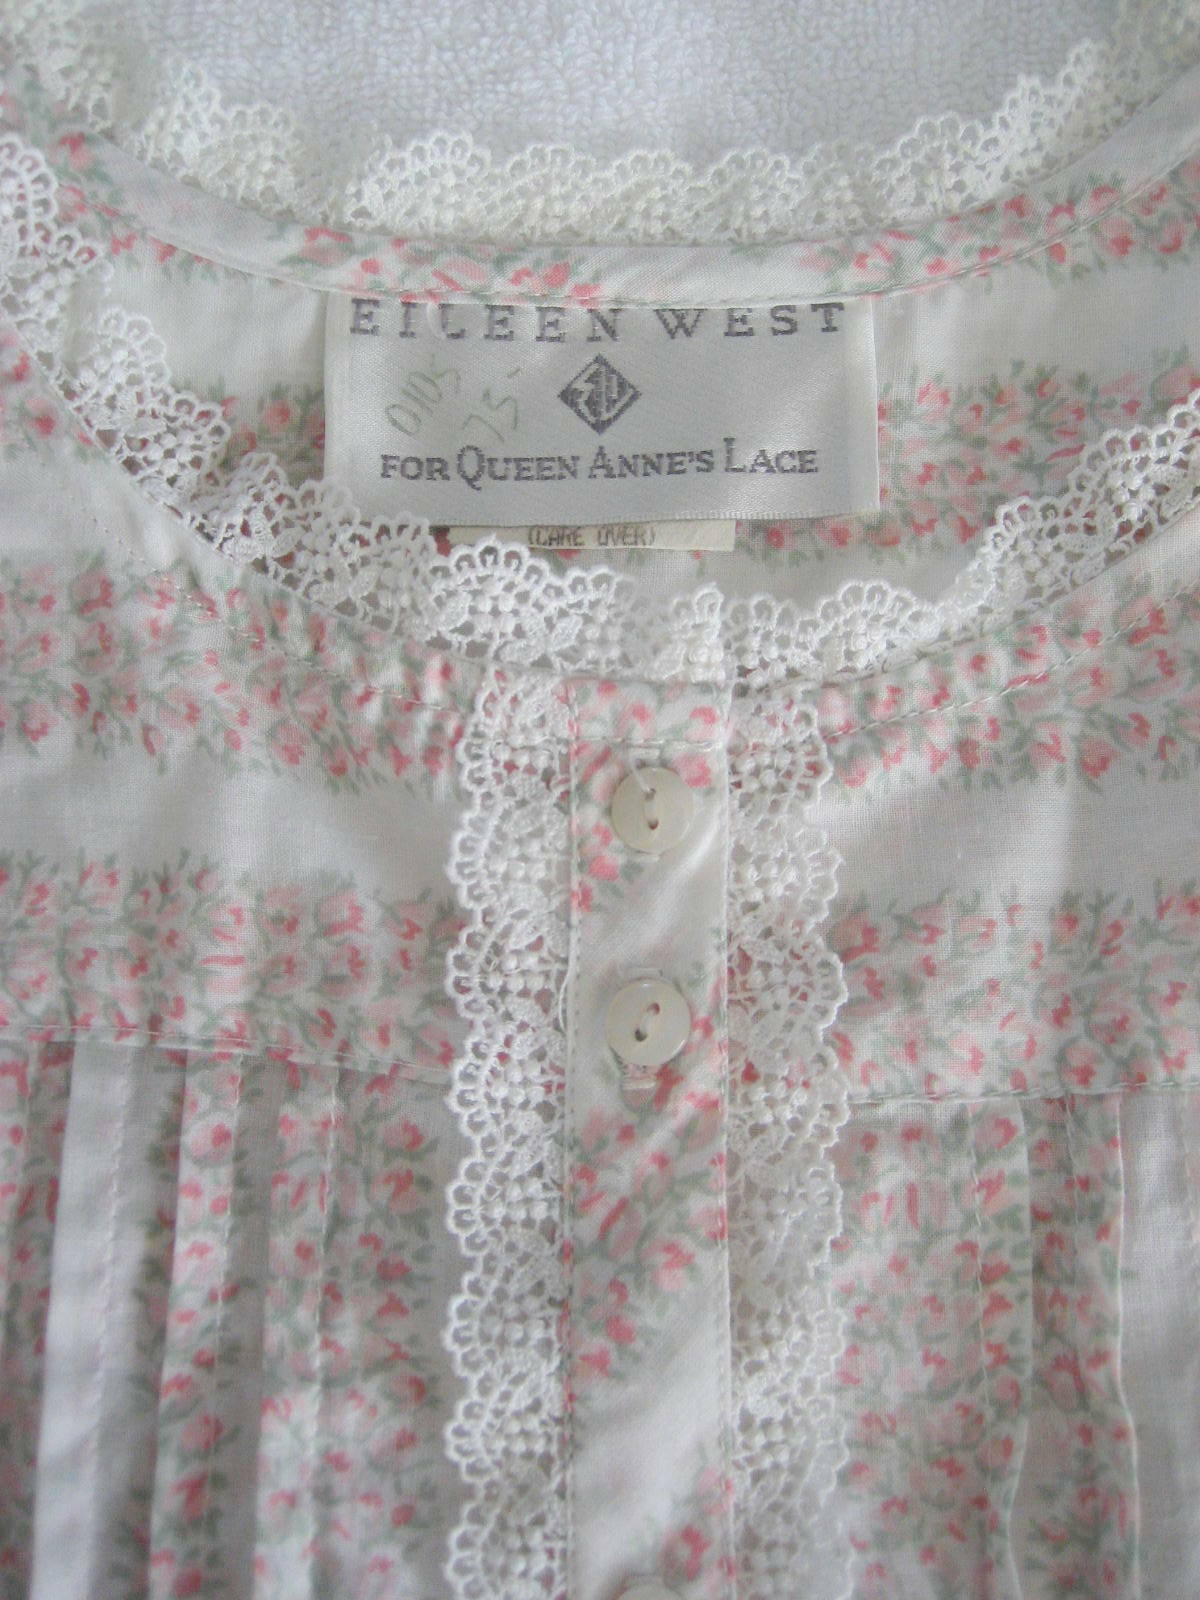 1990s Unworn Eileen West Queen Anne's Lace Nightg… - image 4